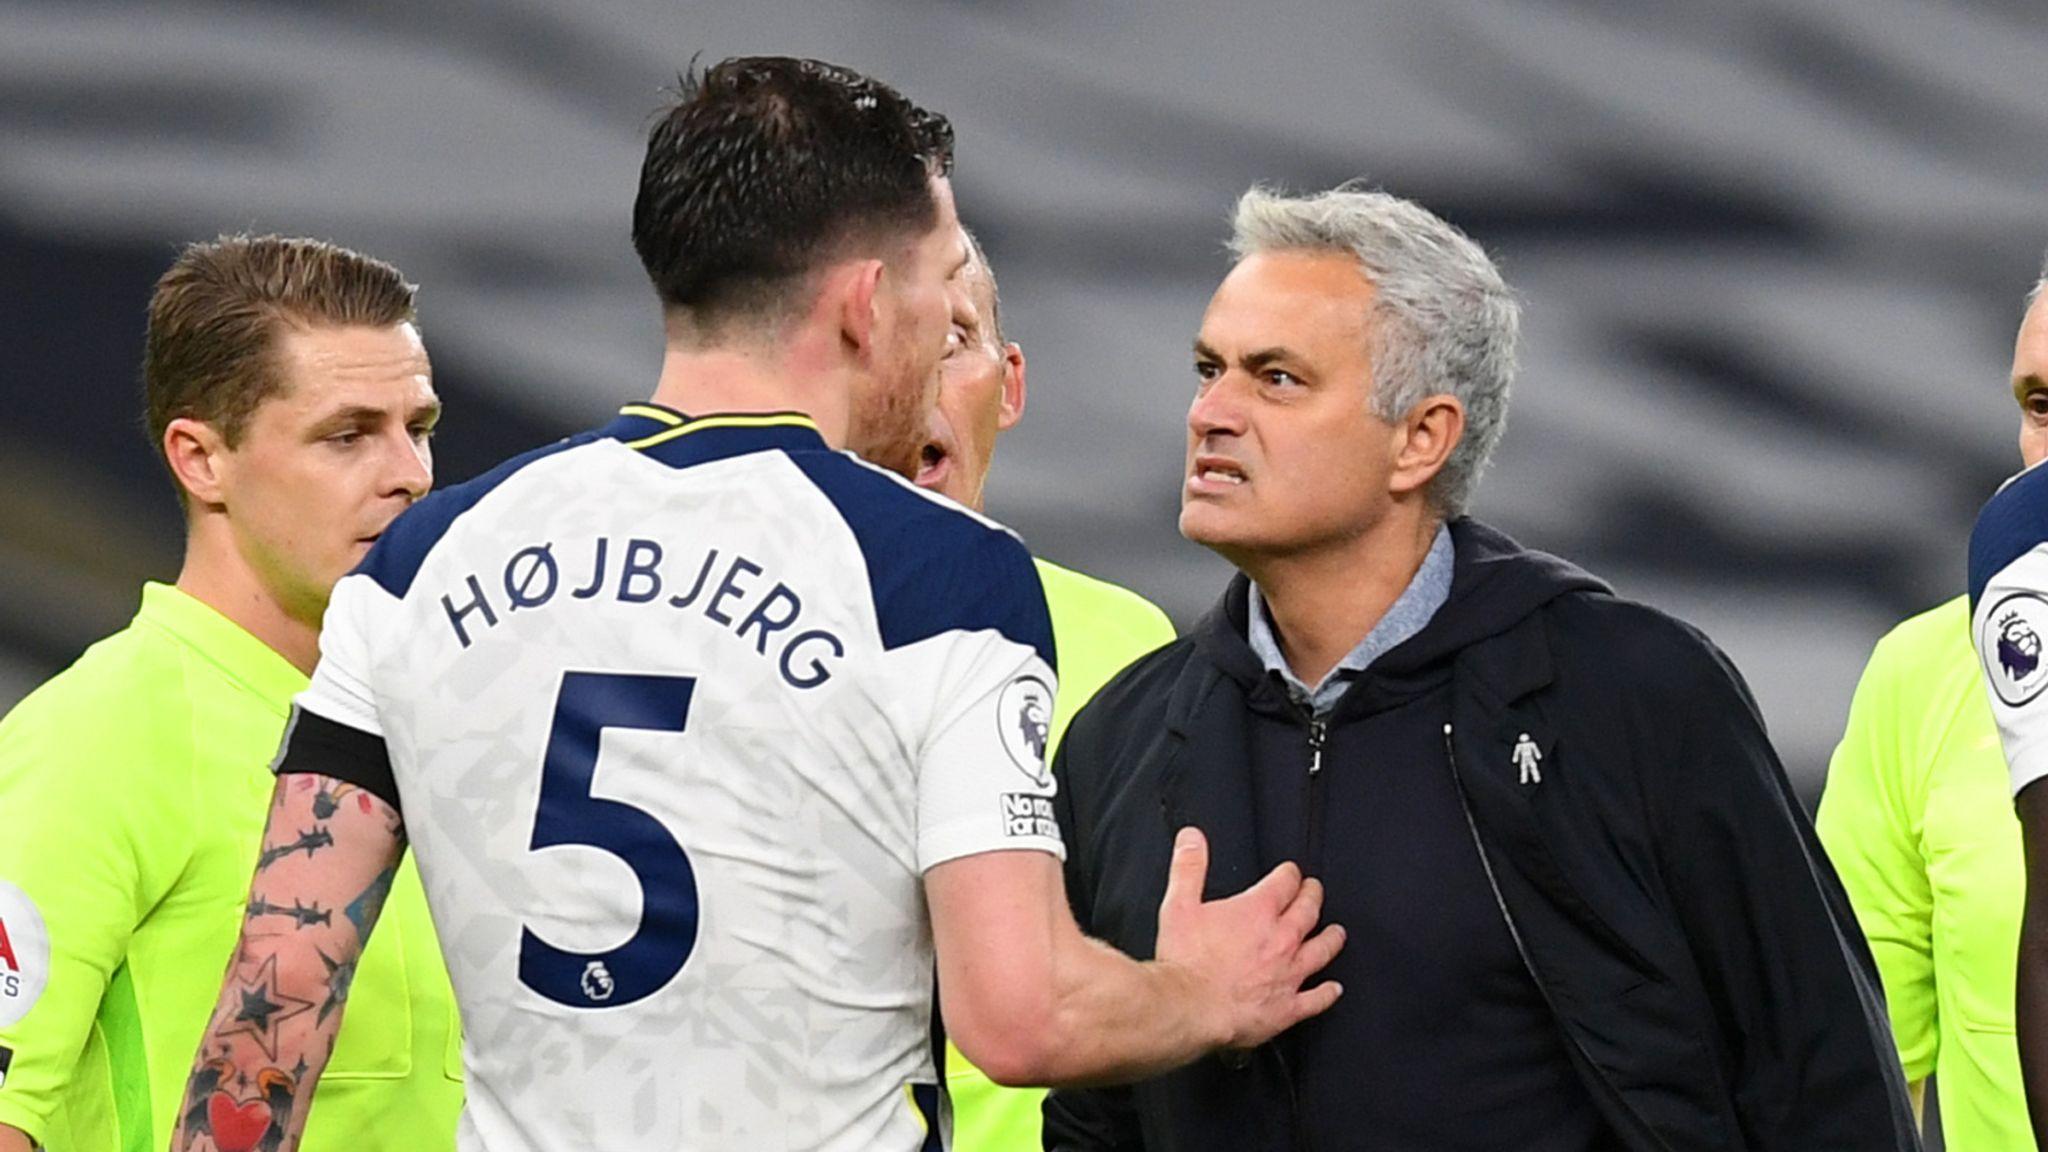 Jose Mourinho, Pierre Emile Højbjerg, Tottenham Hotspur